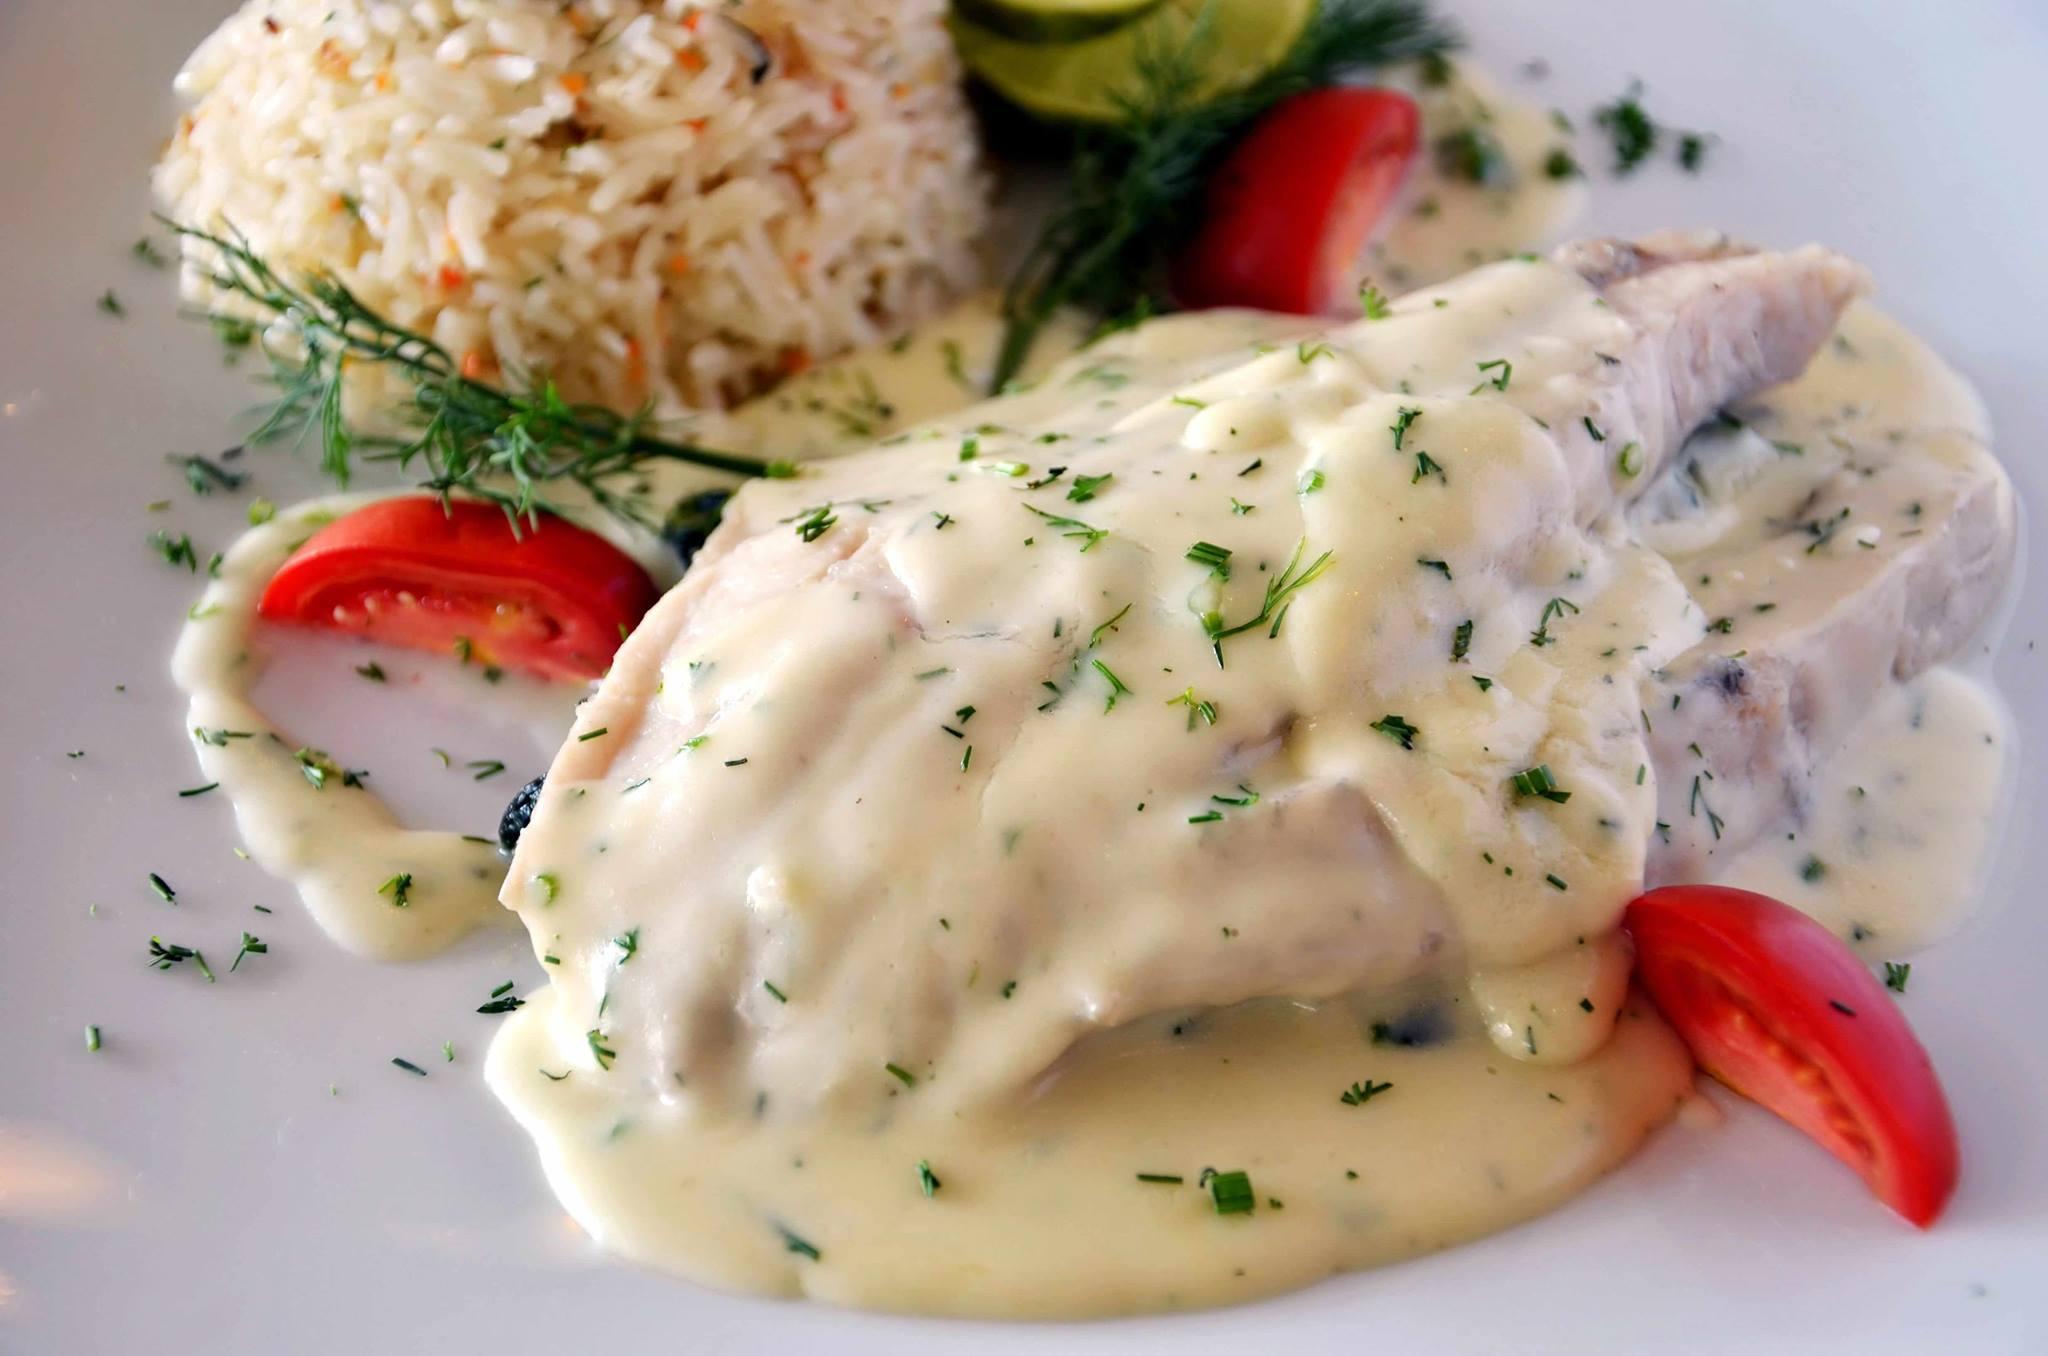 restaurants in ocho rios 2400, best restaurants in ocho rios 170, ocho rios food, where to eat in ocho rios, The Almond Tree Restaurant